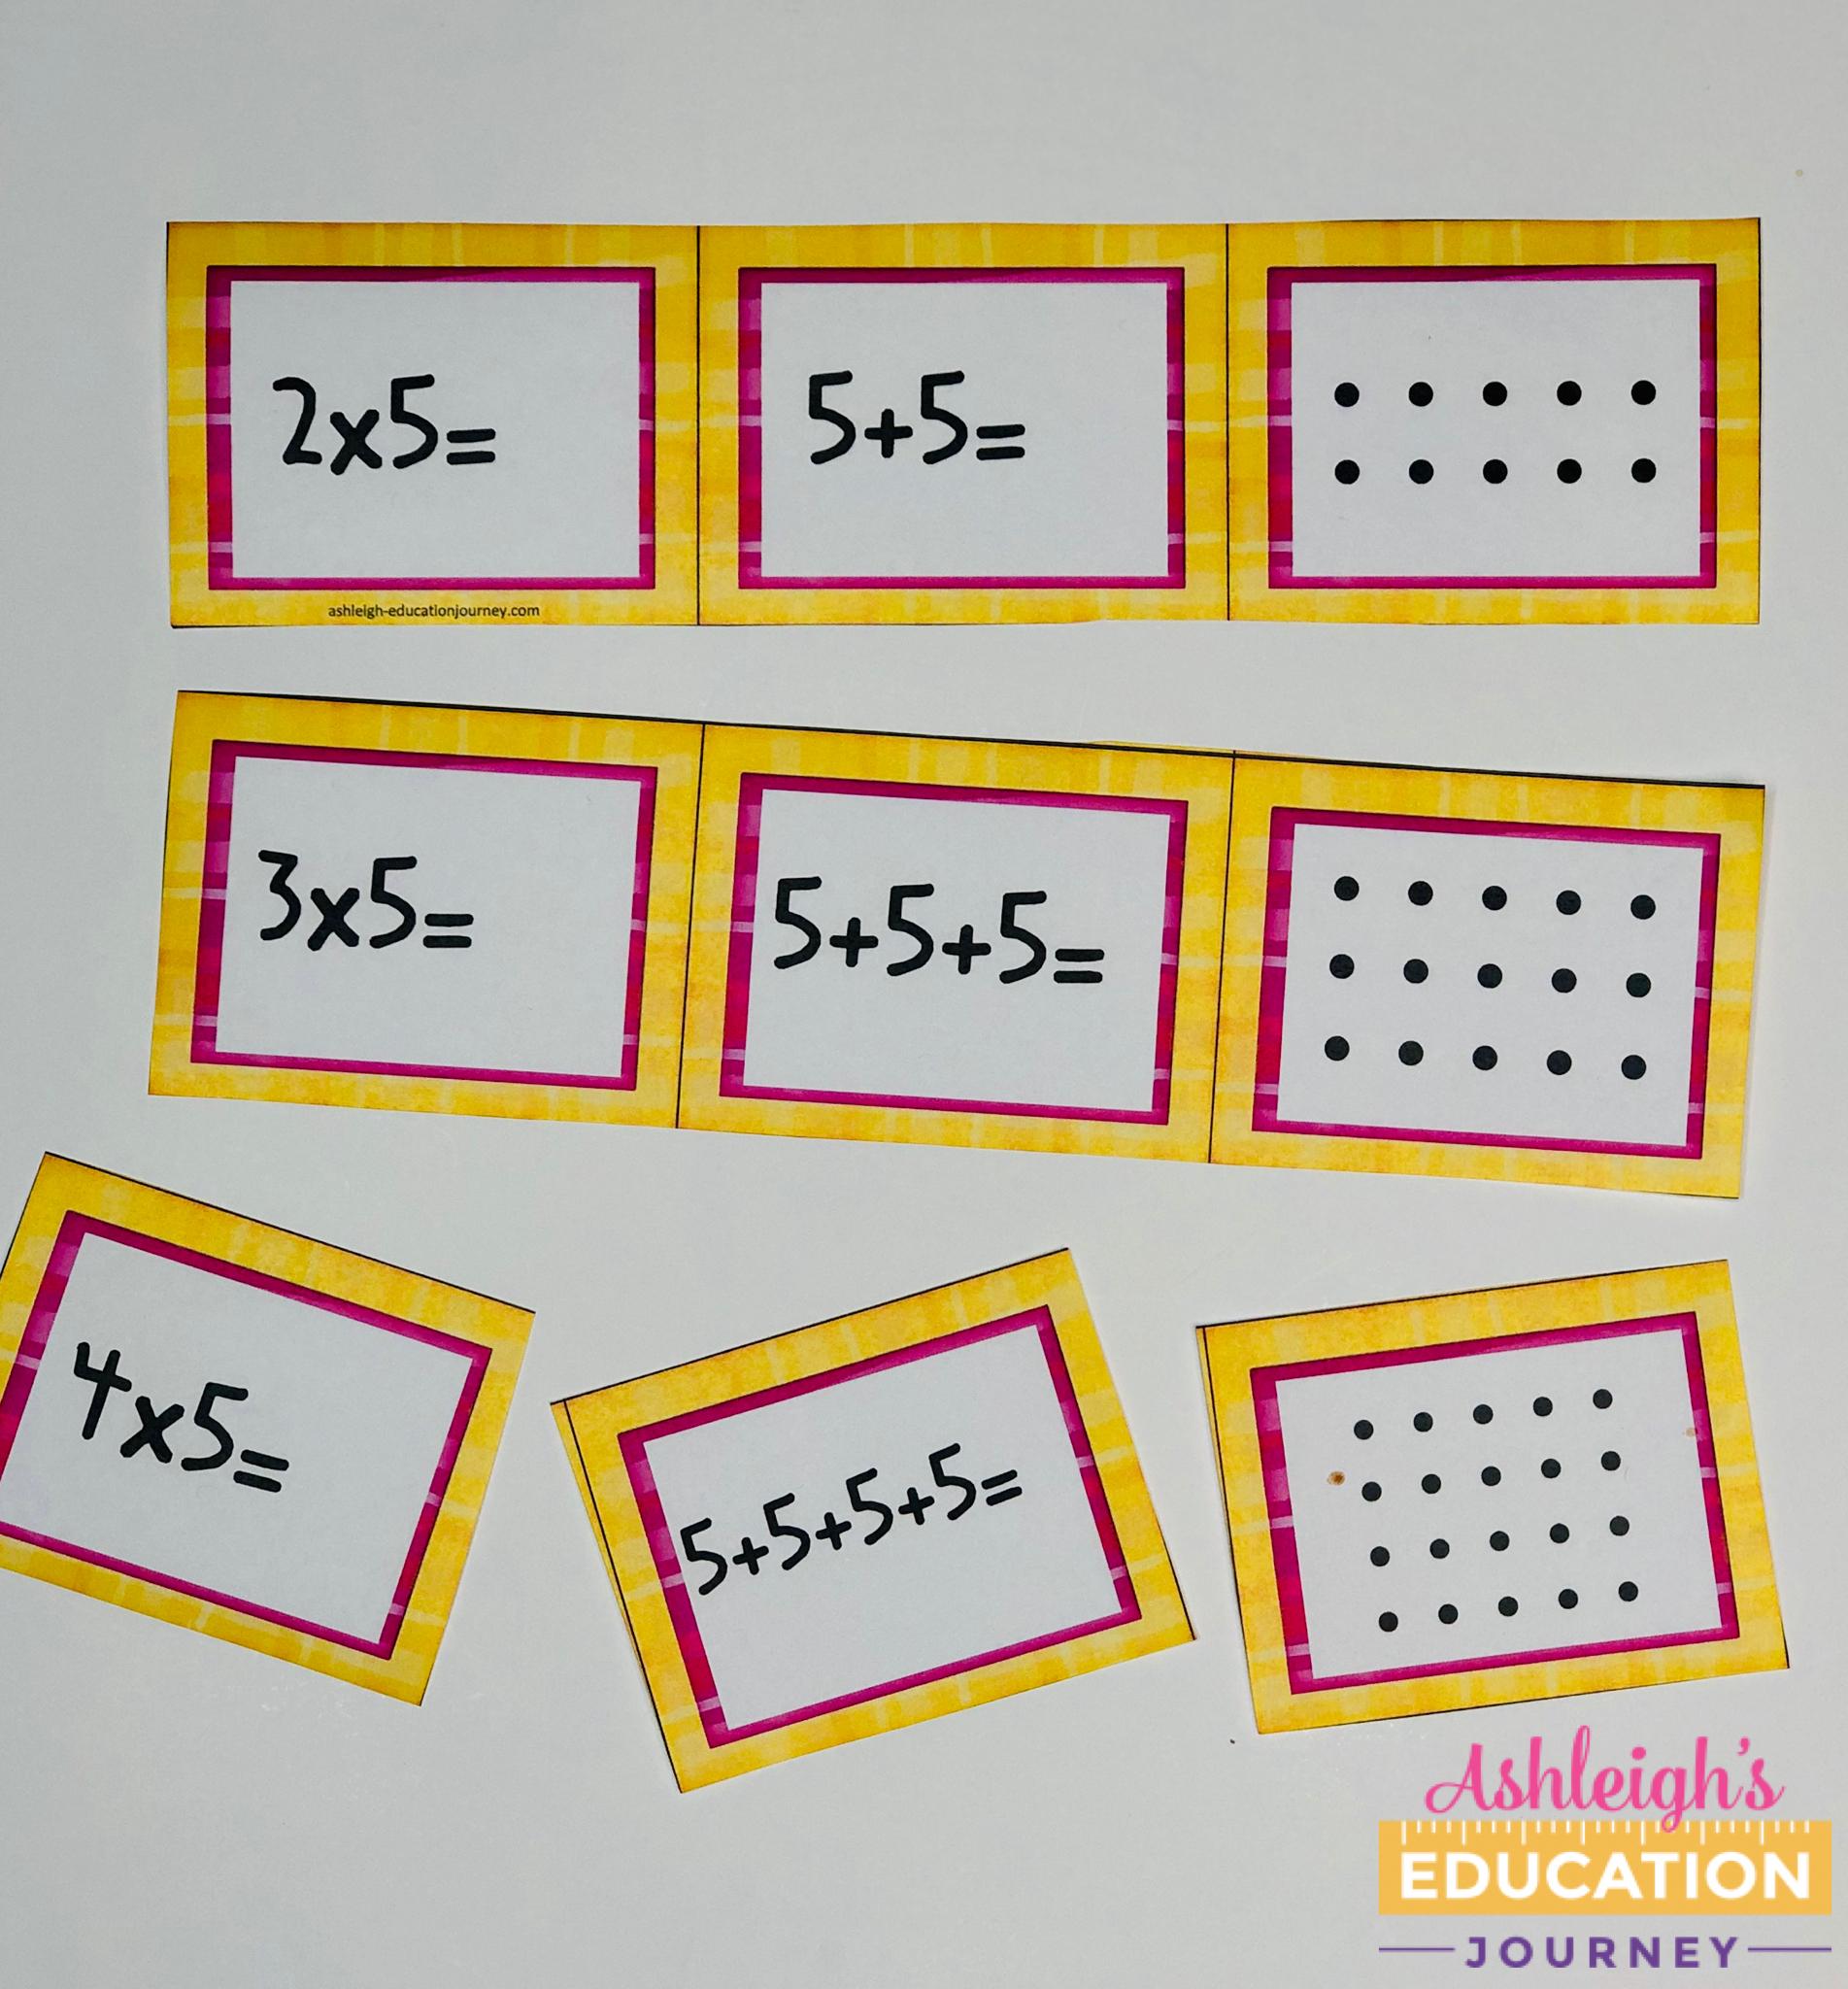 Memorizing Multiplication Facts - Ashleigh's Education Journey